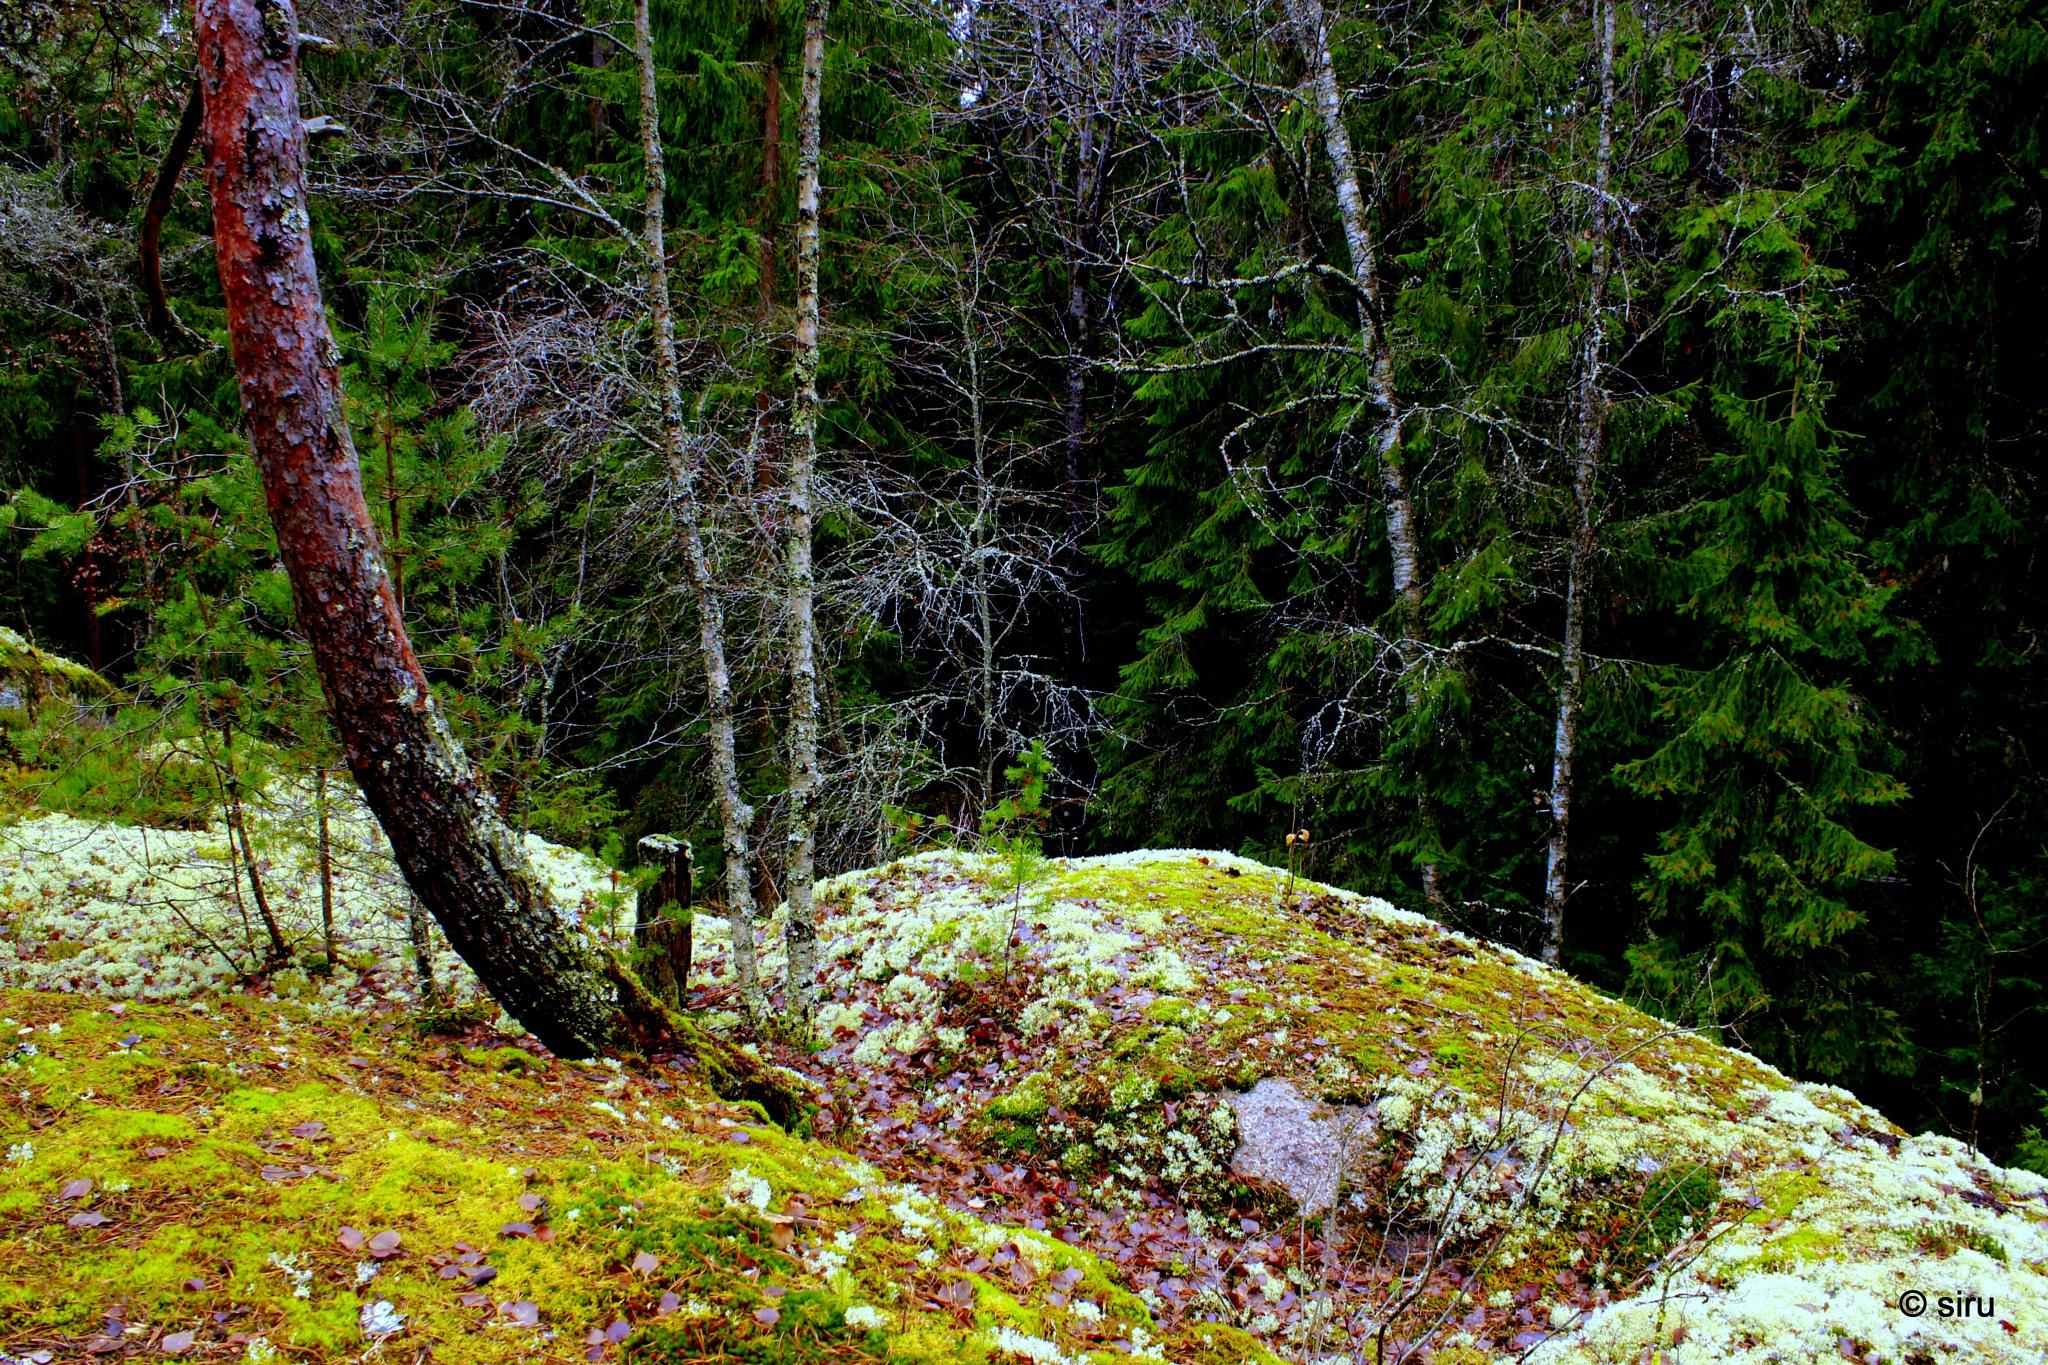 Finnish nature 2 by siru tuominen